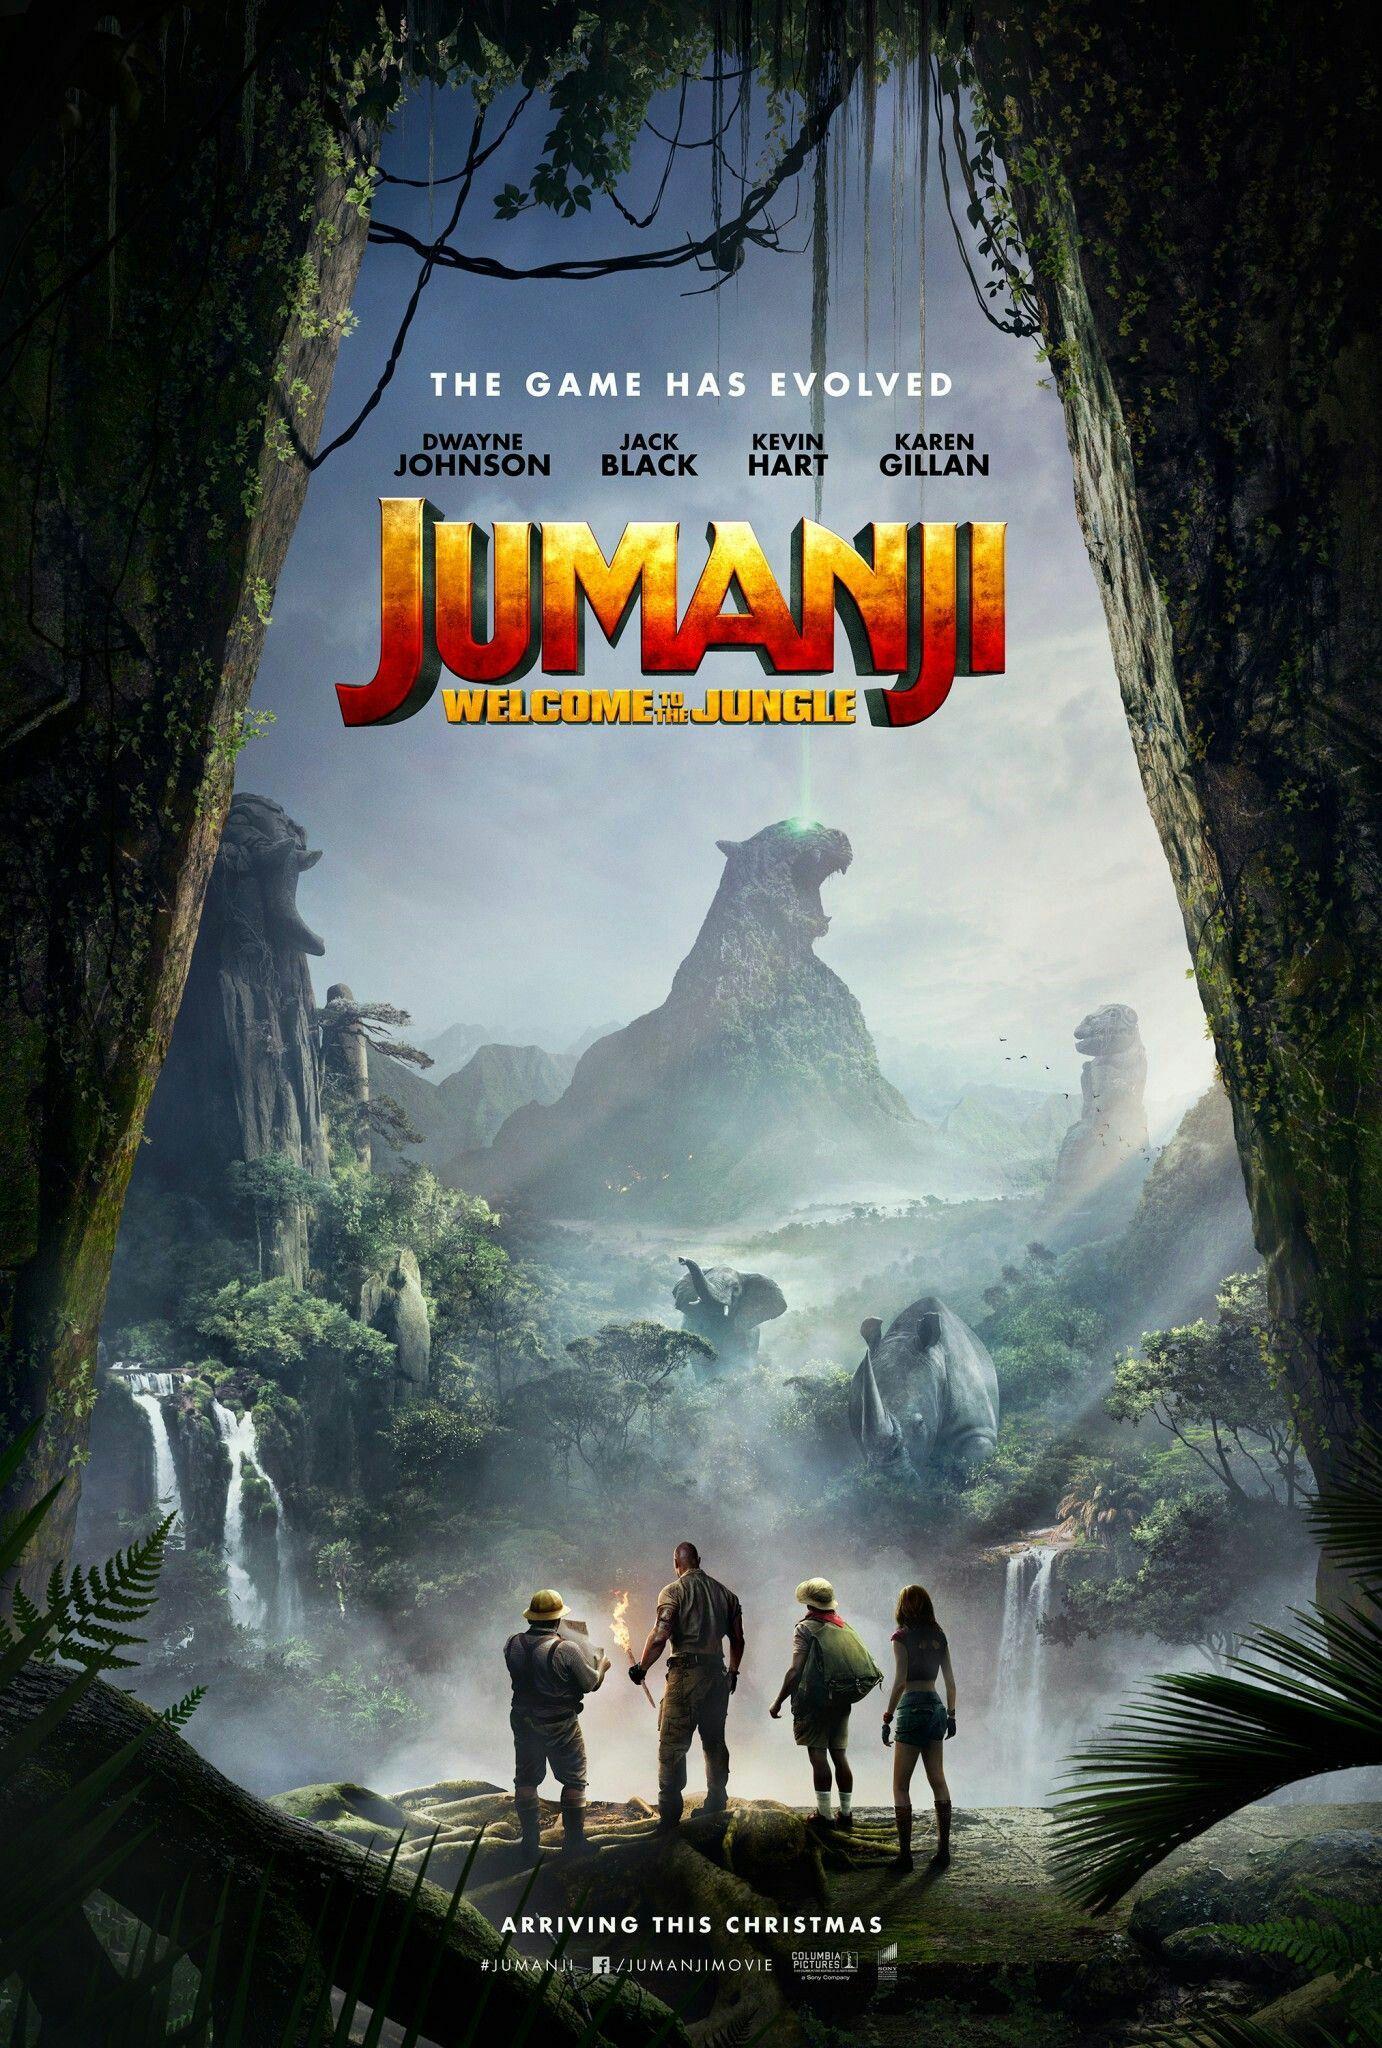 Jumanji Movie Poster Assistir Jumanji Filmes Online Gratis